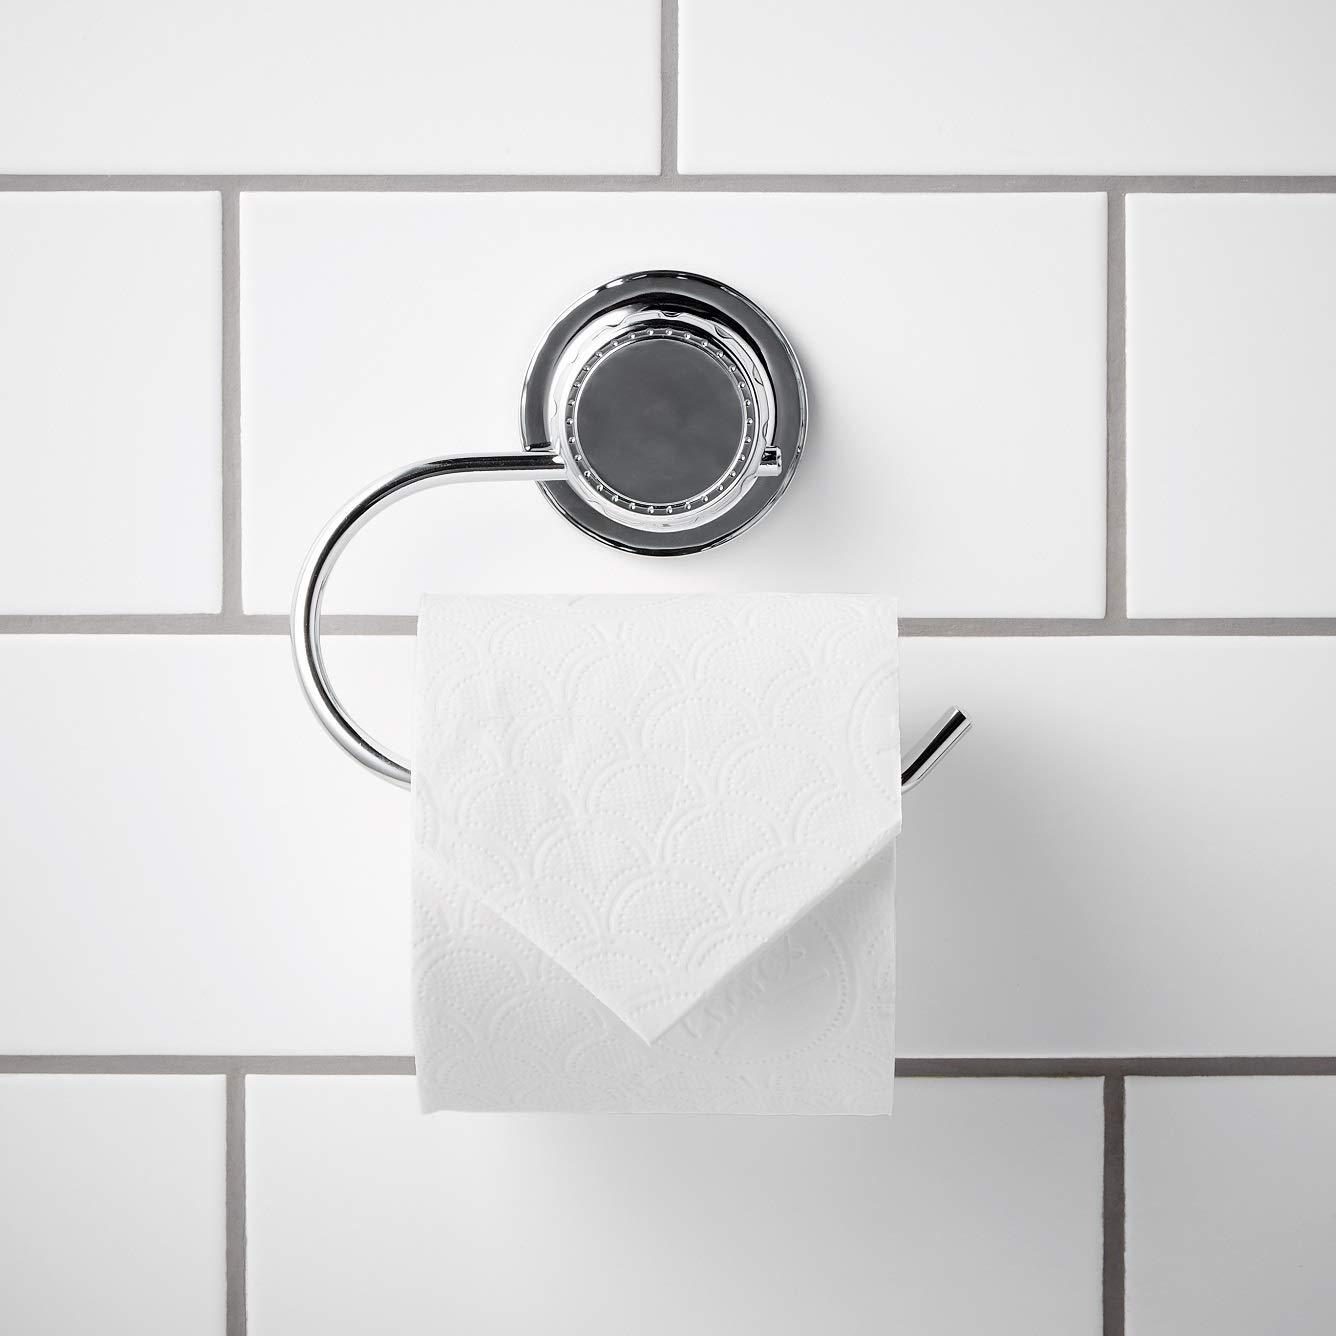 Soporte para toallas de ba/ño simplywire Resistente al /óxido Cromado Toallero ovalado con ventosa s/úper potente